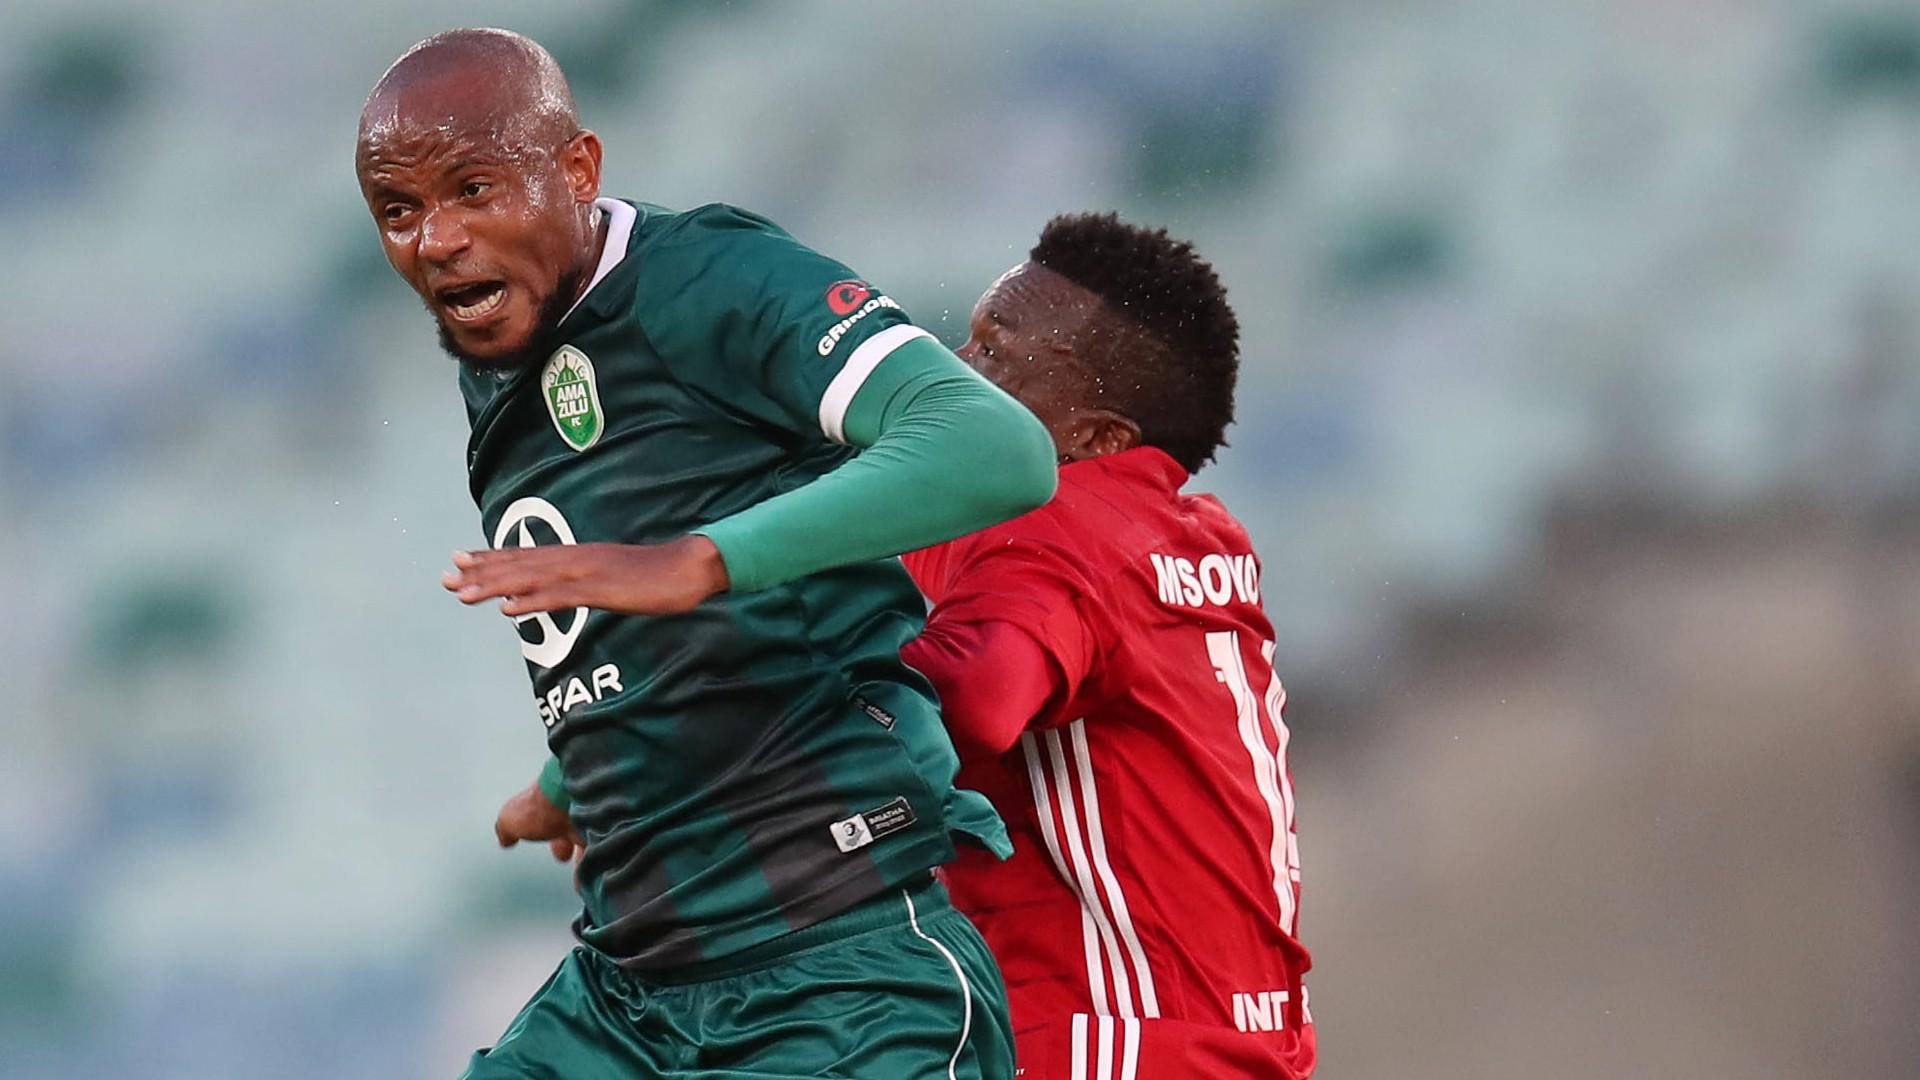 Caf Champions League: AmaZulu FC 0-1 Nyasa Big Bullets: Ex-Orlando Pirates striker slays Usuthu